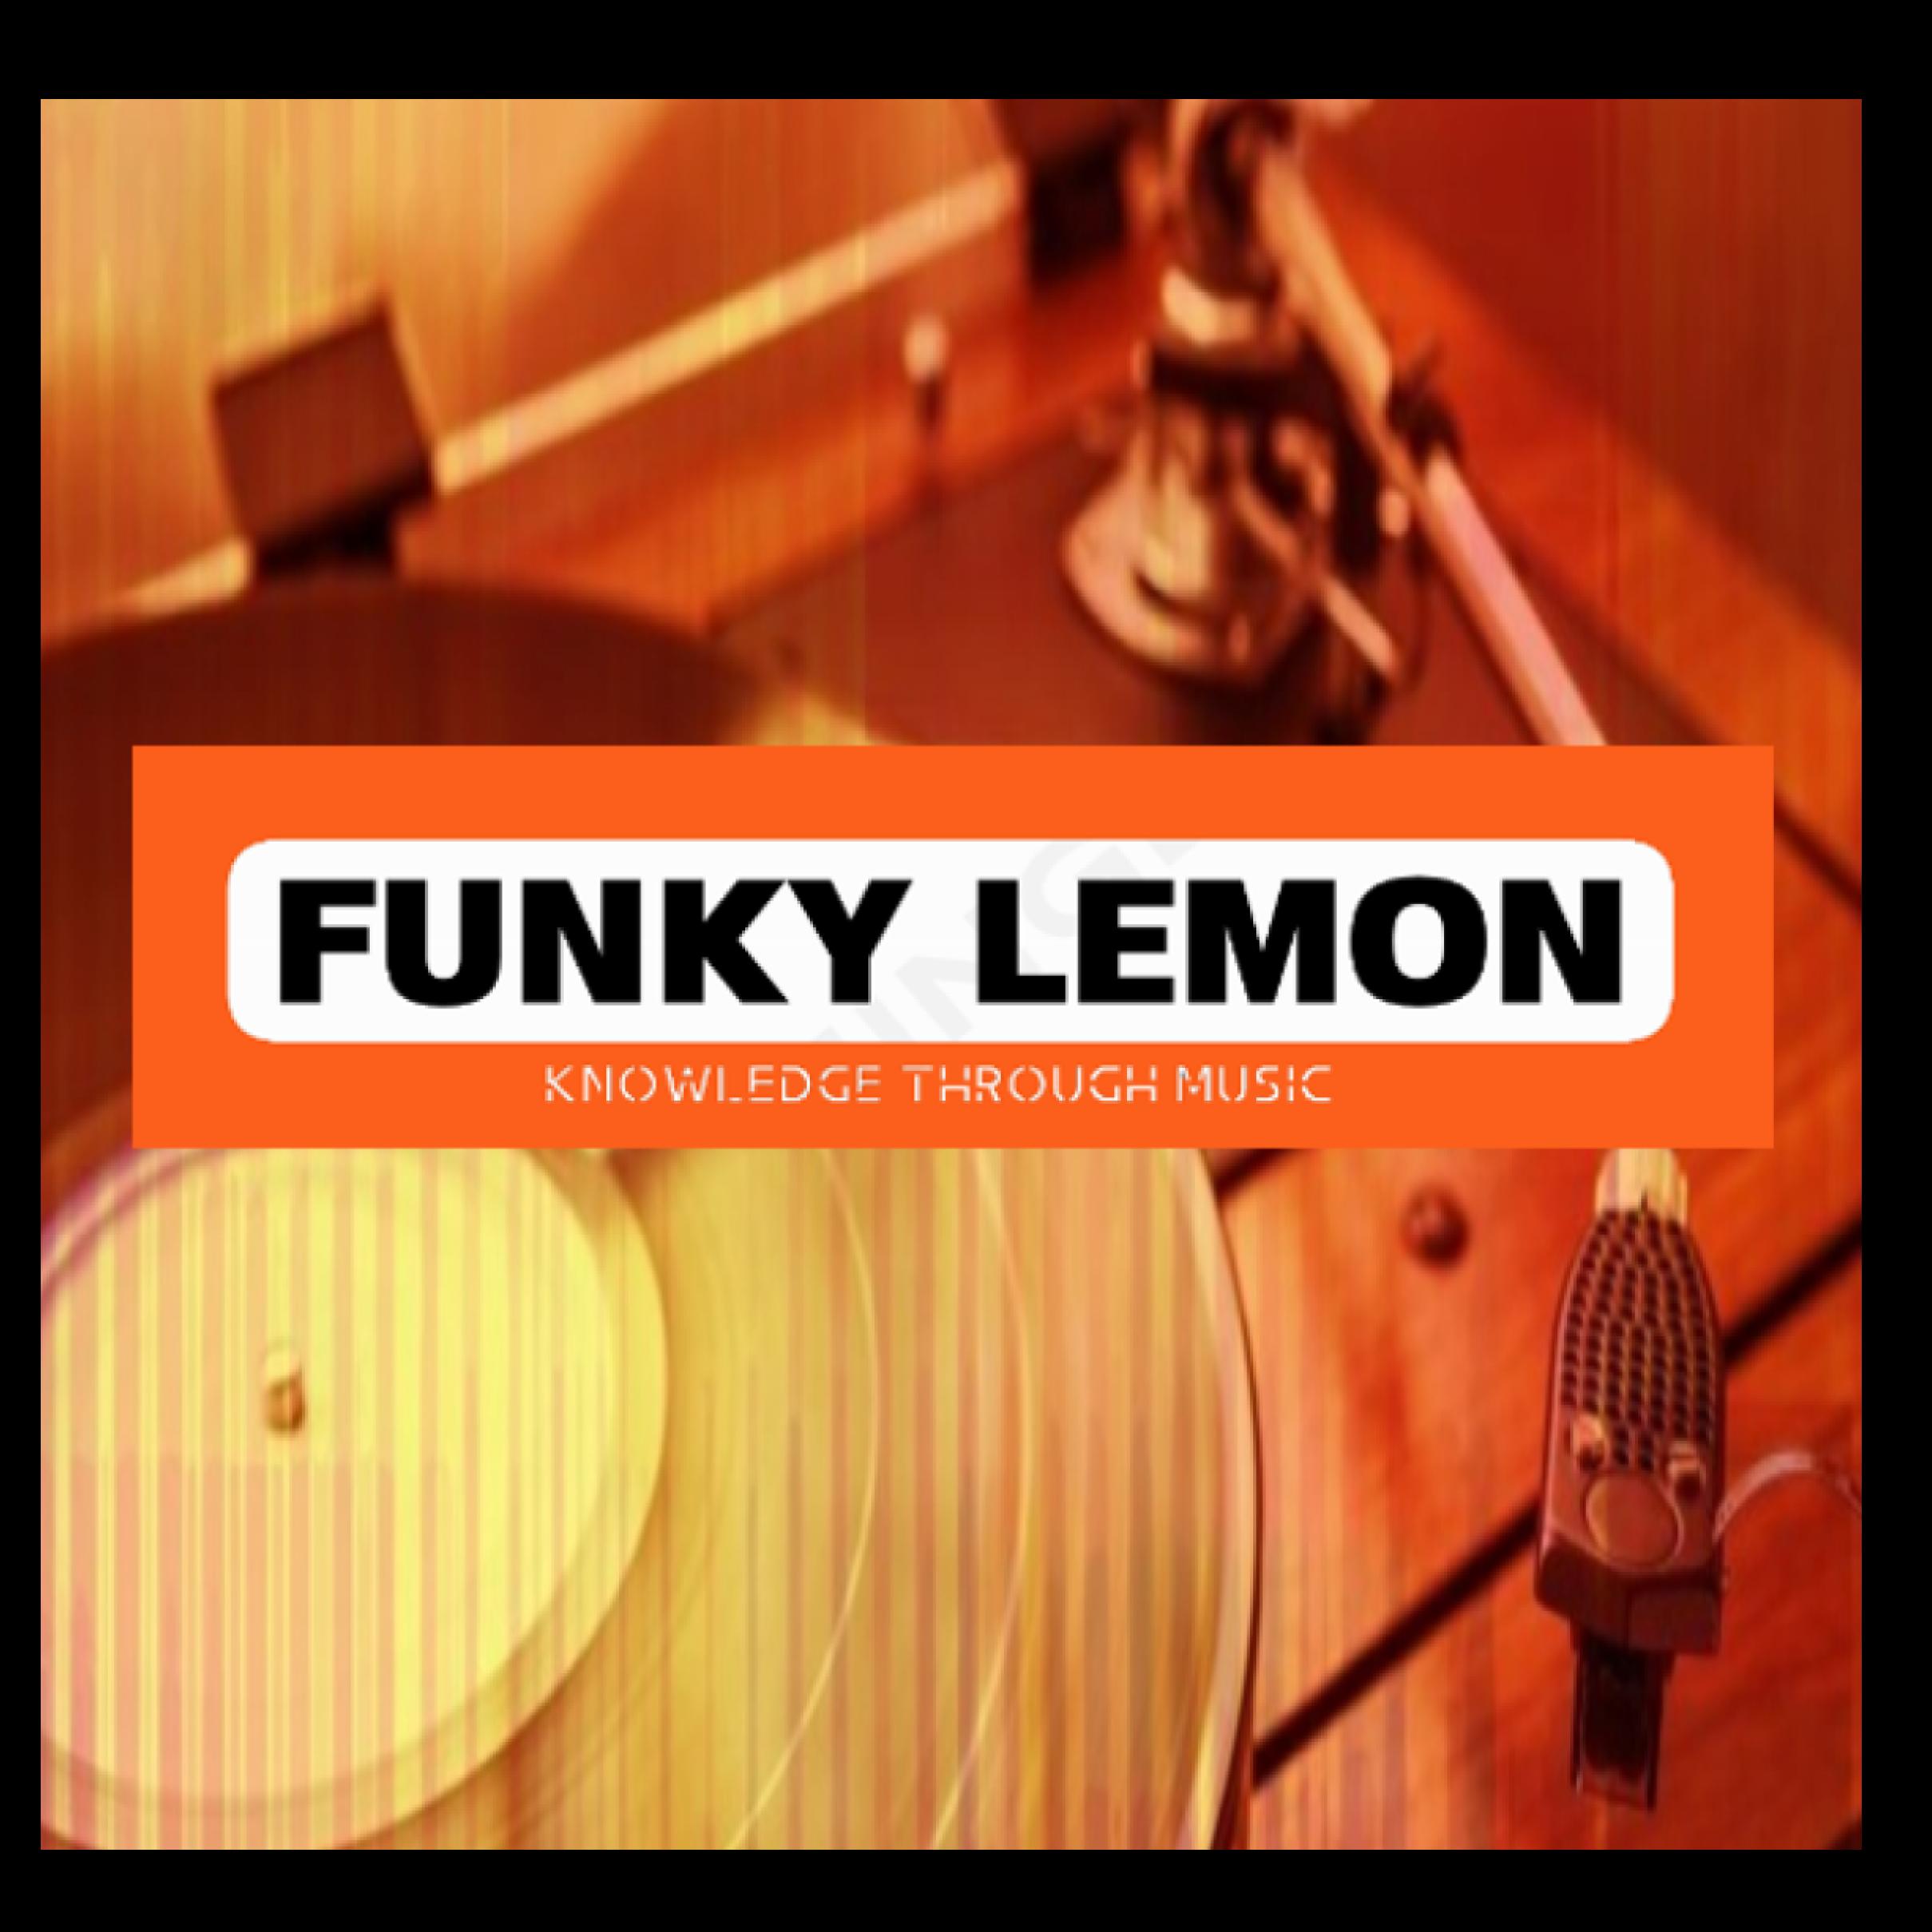 FunkyLemon